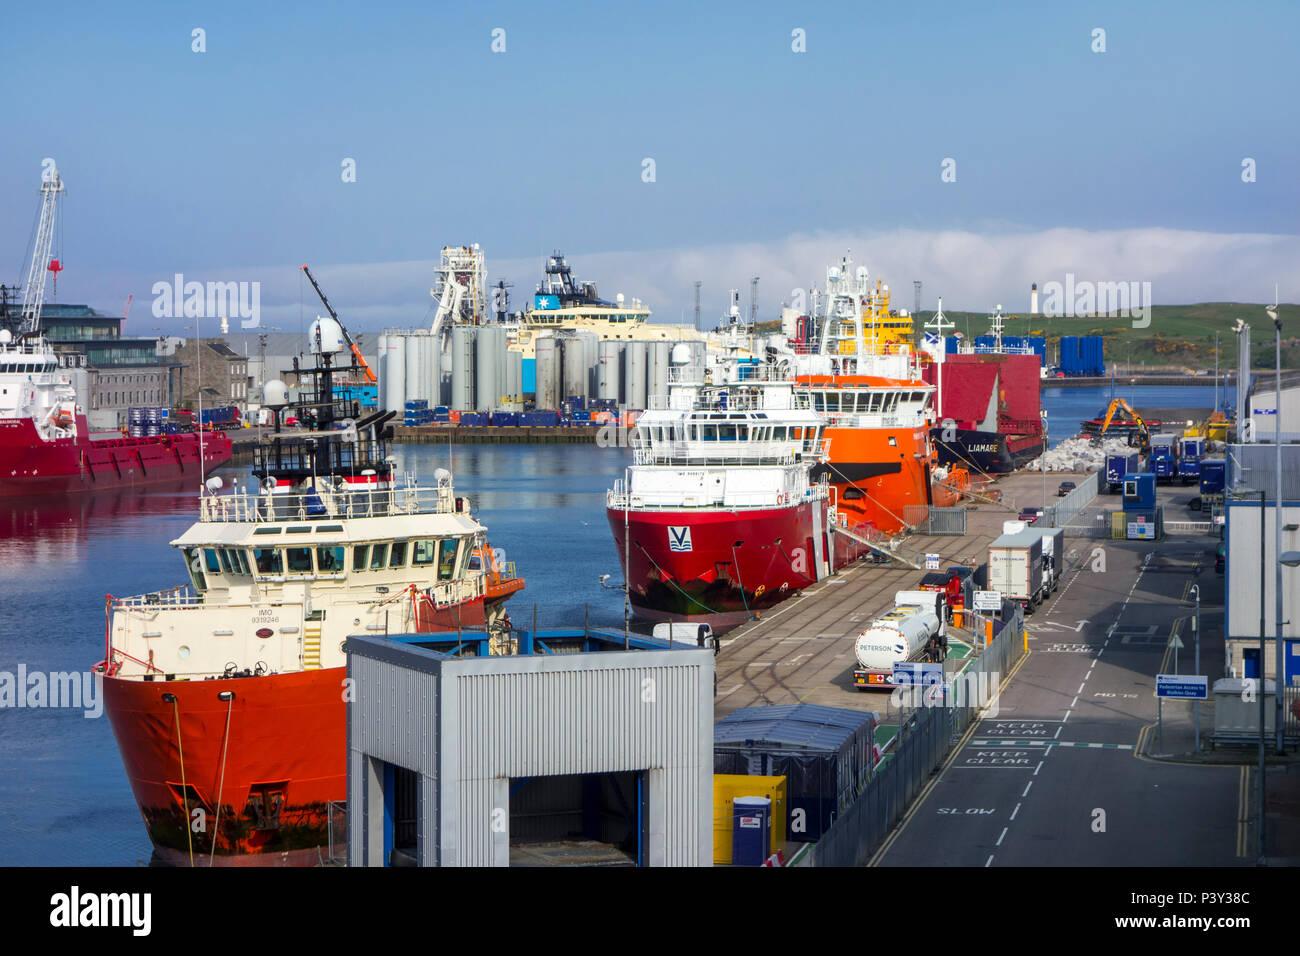 Vessels docked in the Aberdeen port / harbour, Aberdeenshire, Scotland, UK - Stock Image